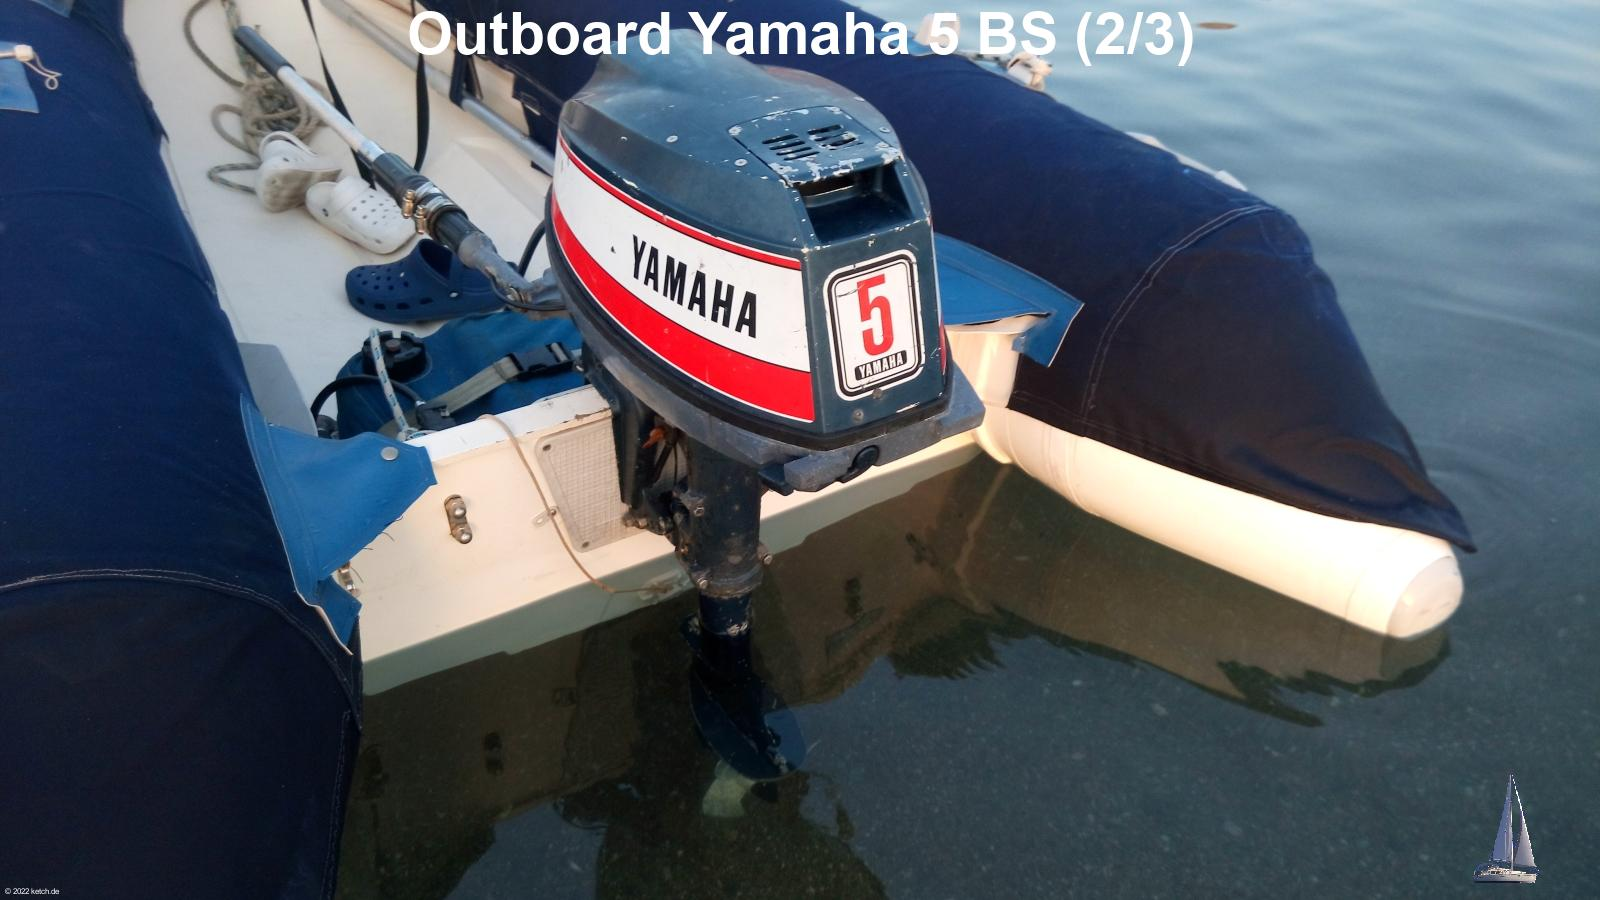 Outboard Yamaha 5 BS (2/3)